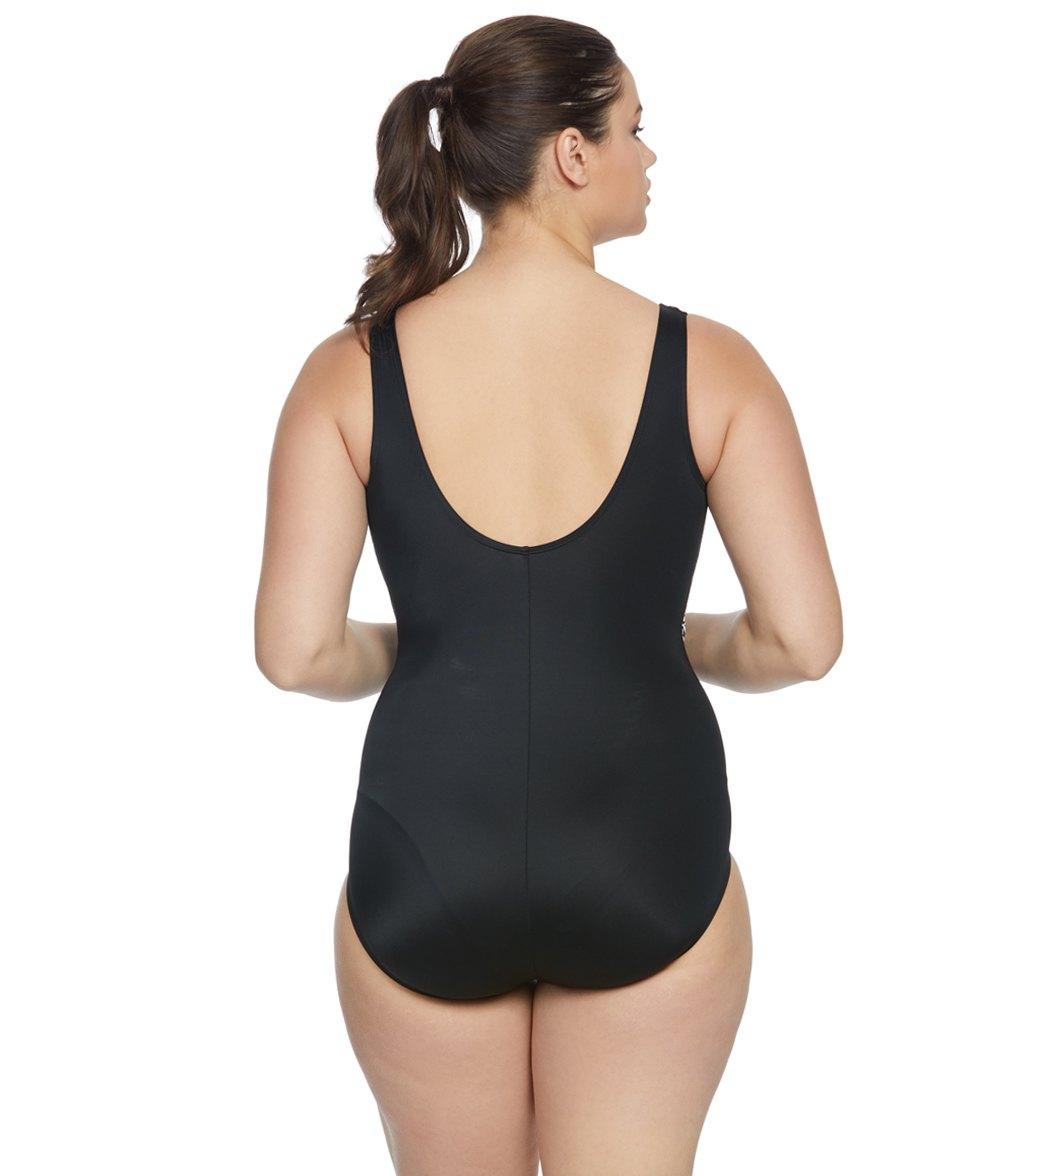 50ee61df4ff Longitude Plus Size Golden Goddess Surplice One Piece Swimsuit at ...